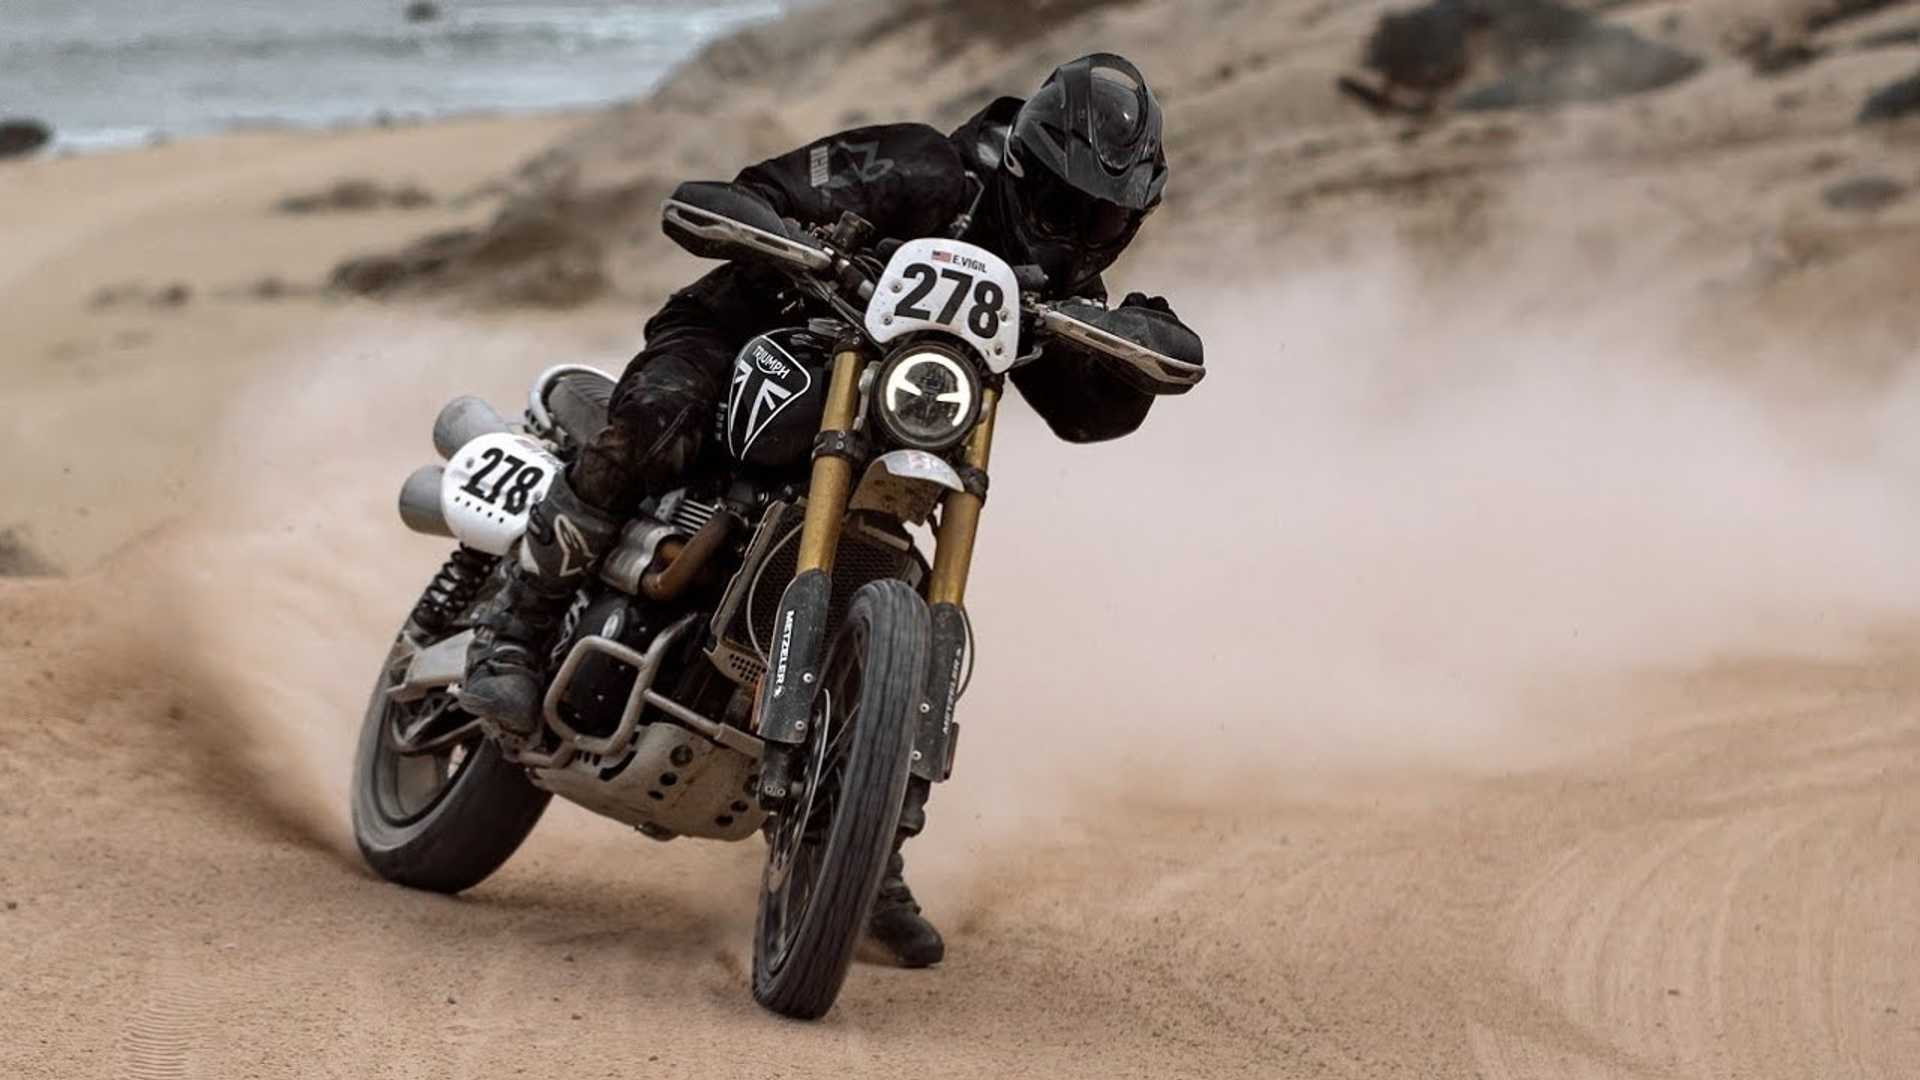 Fantastic Dirt Riding Video Proves Triumph's Scrambler Has What It Takes